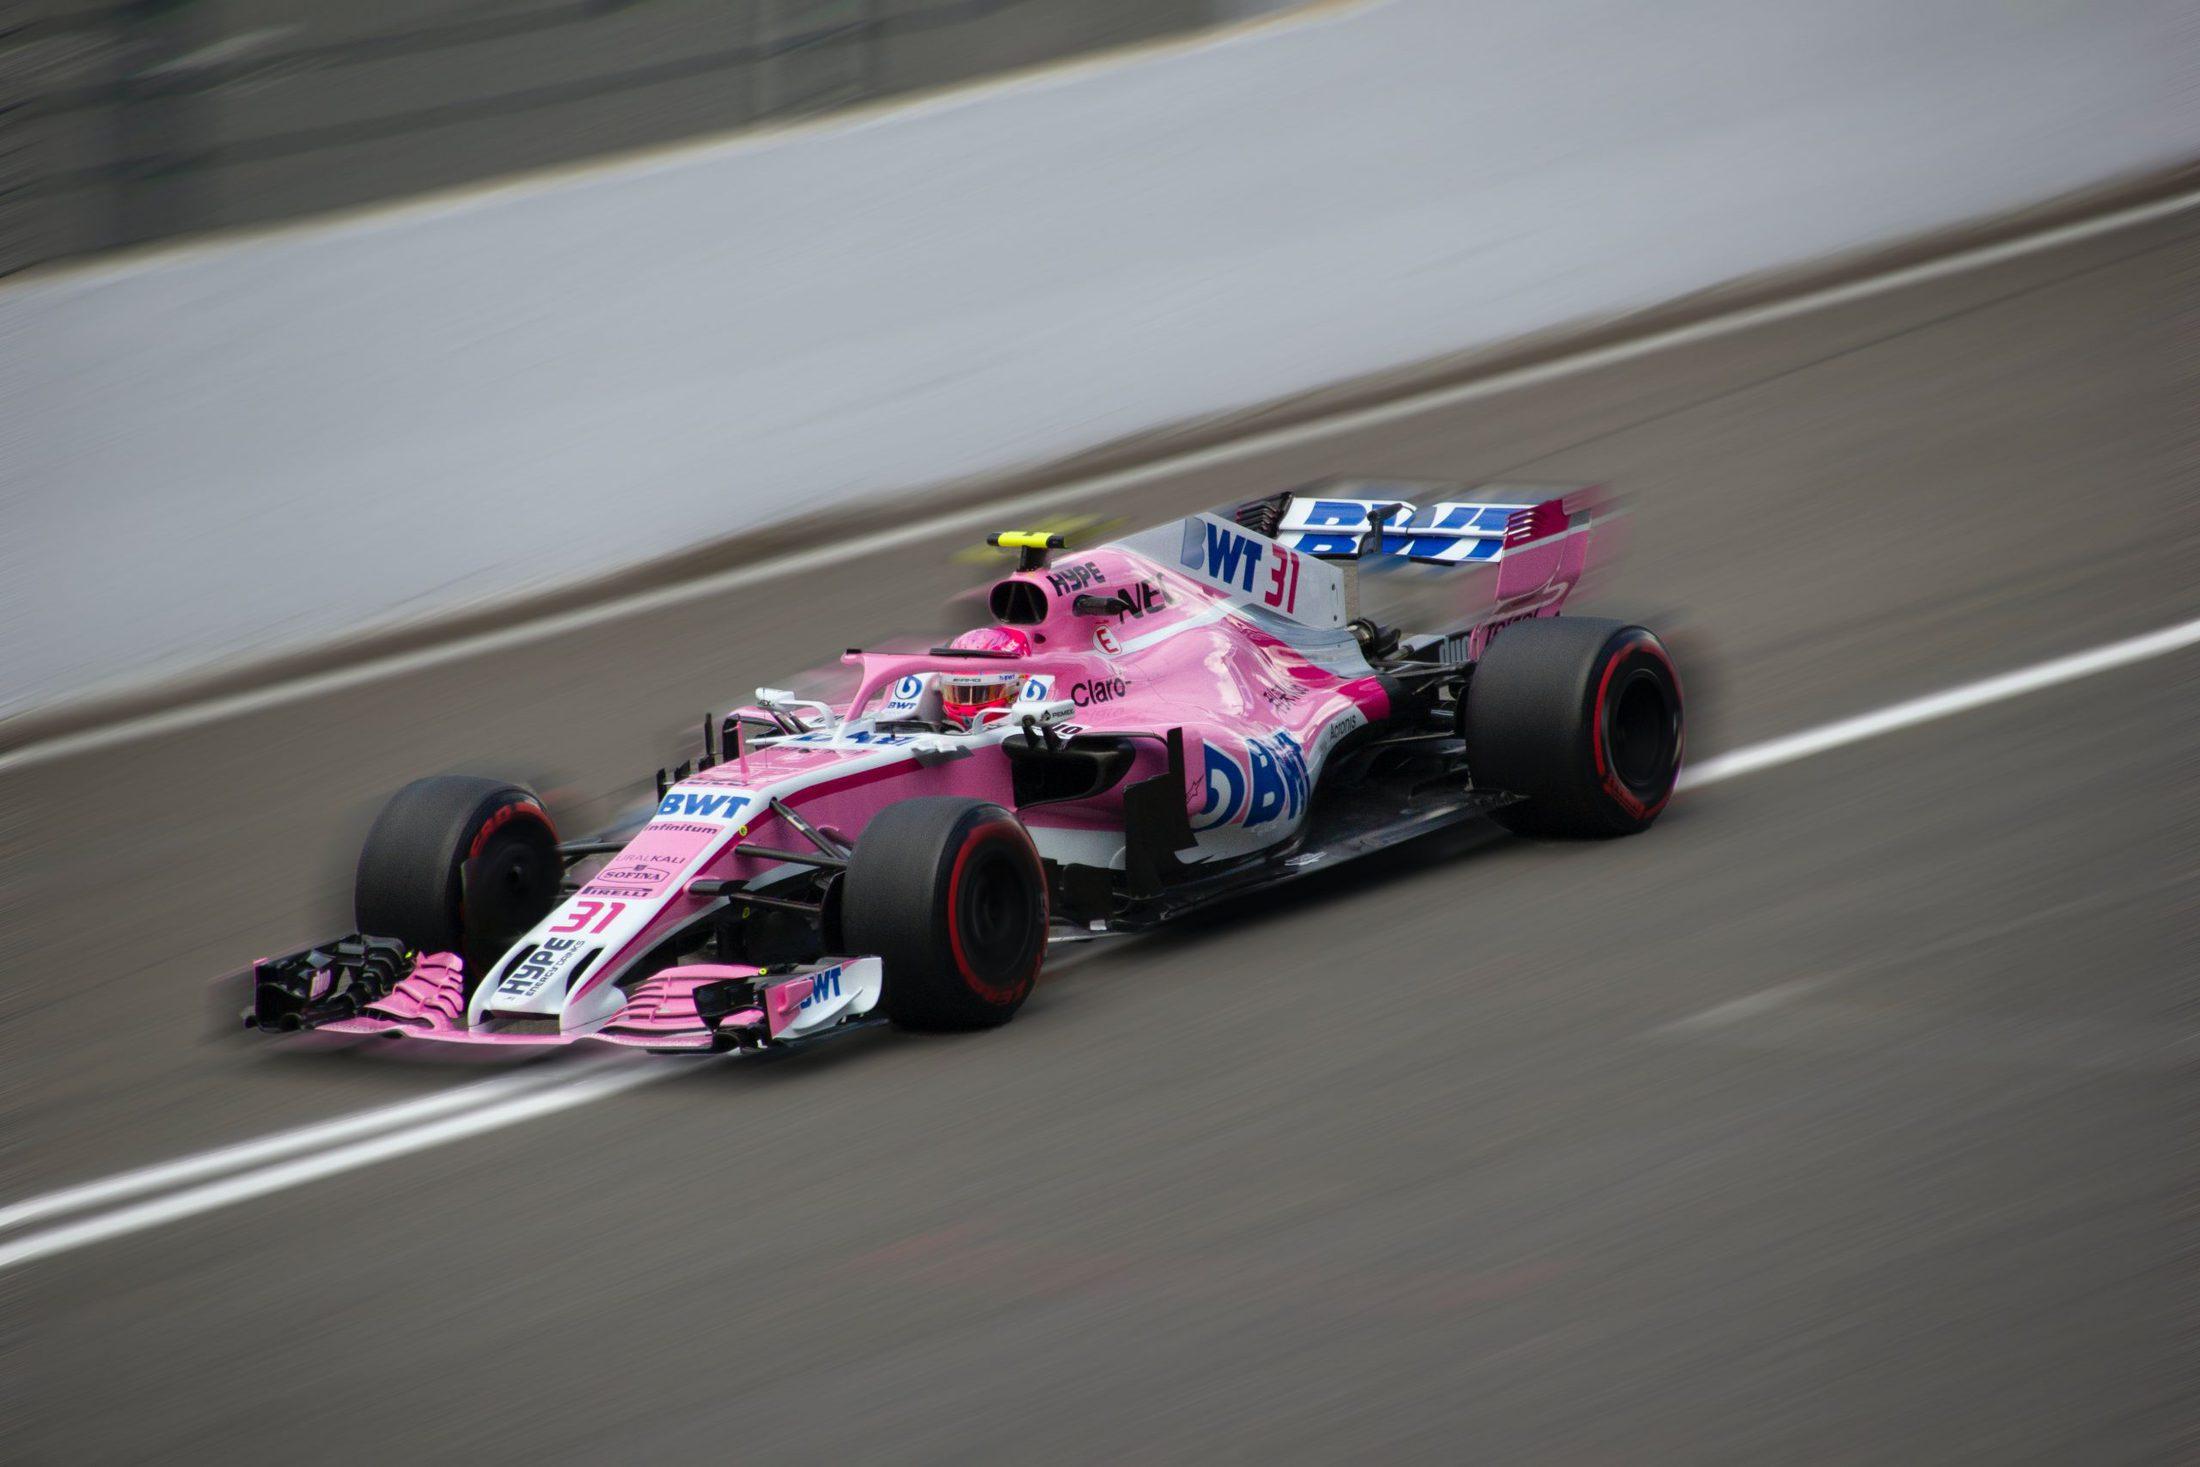 Belgian Grand Prix 2021 – Hotel – Spa-Francorchamps